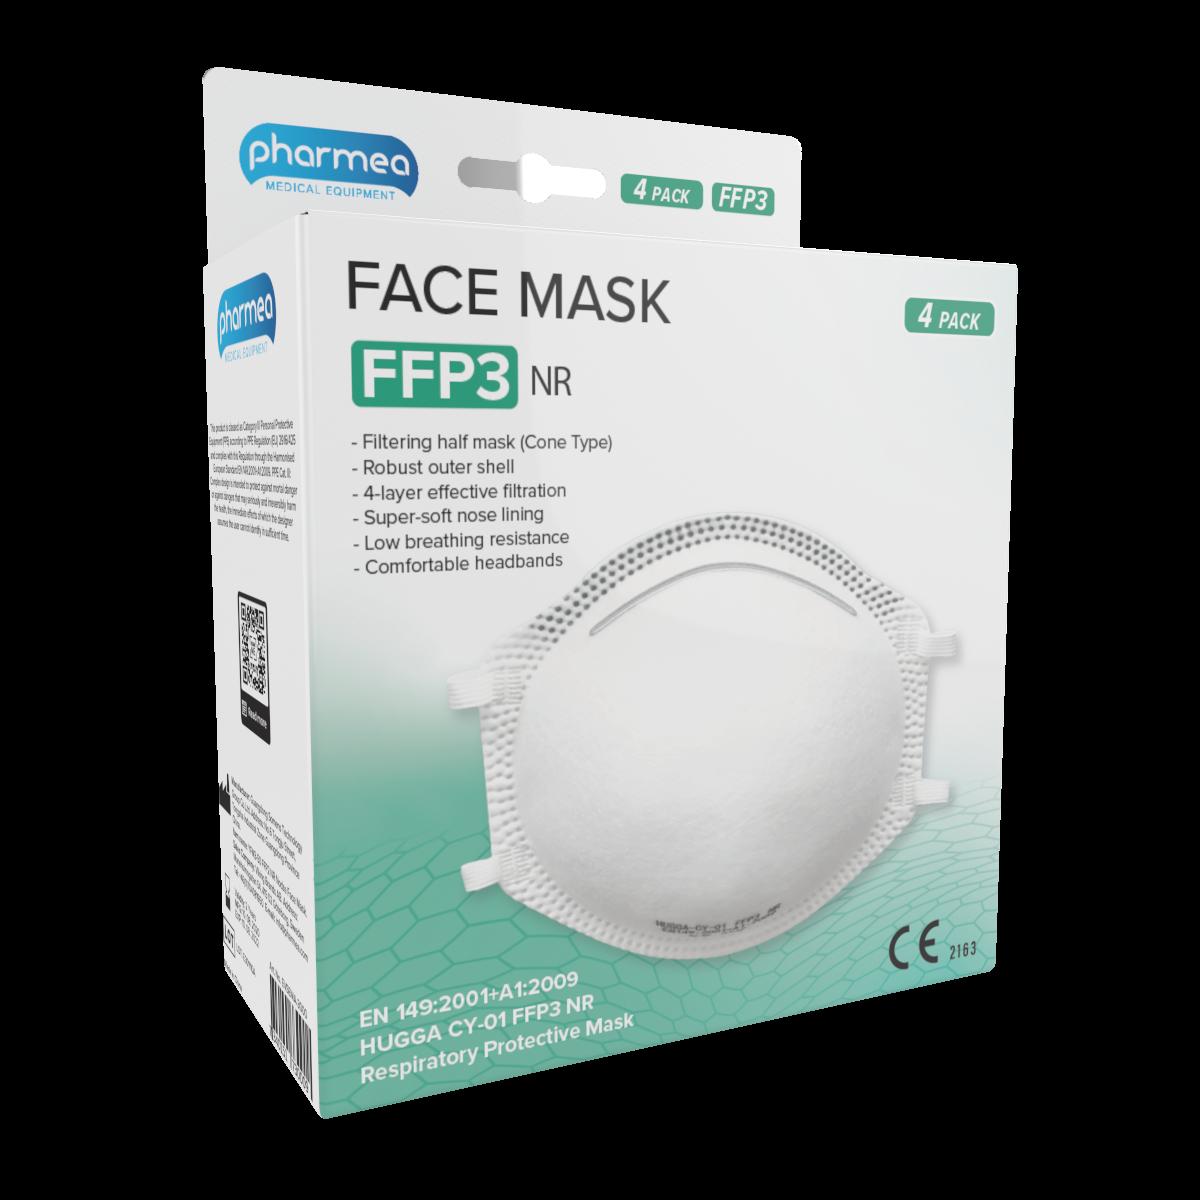 Pharmea Facemask FFP3 Mondmaskers 4 stuks